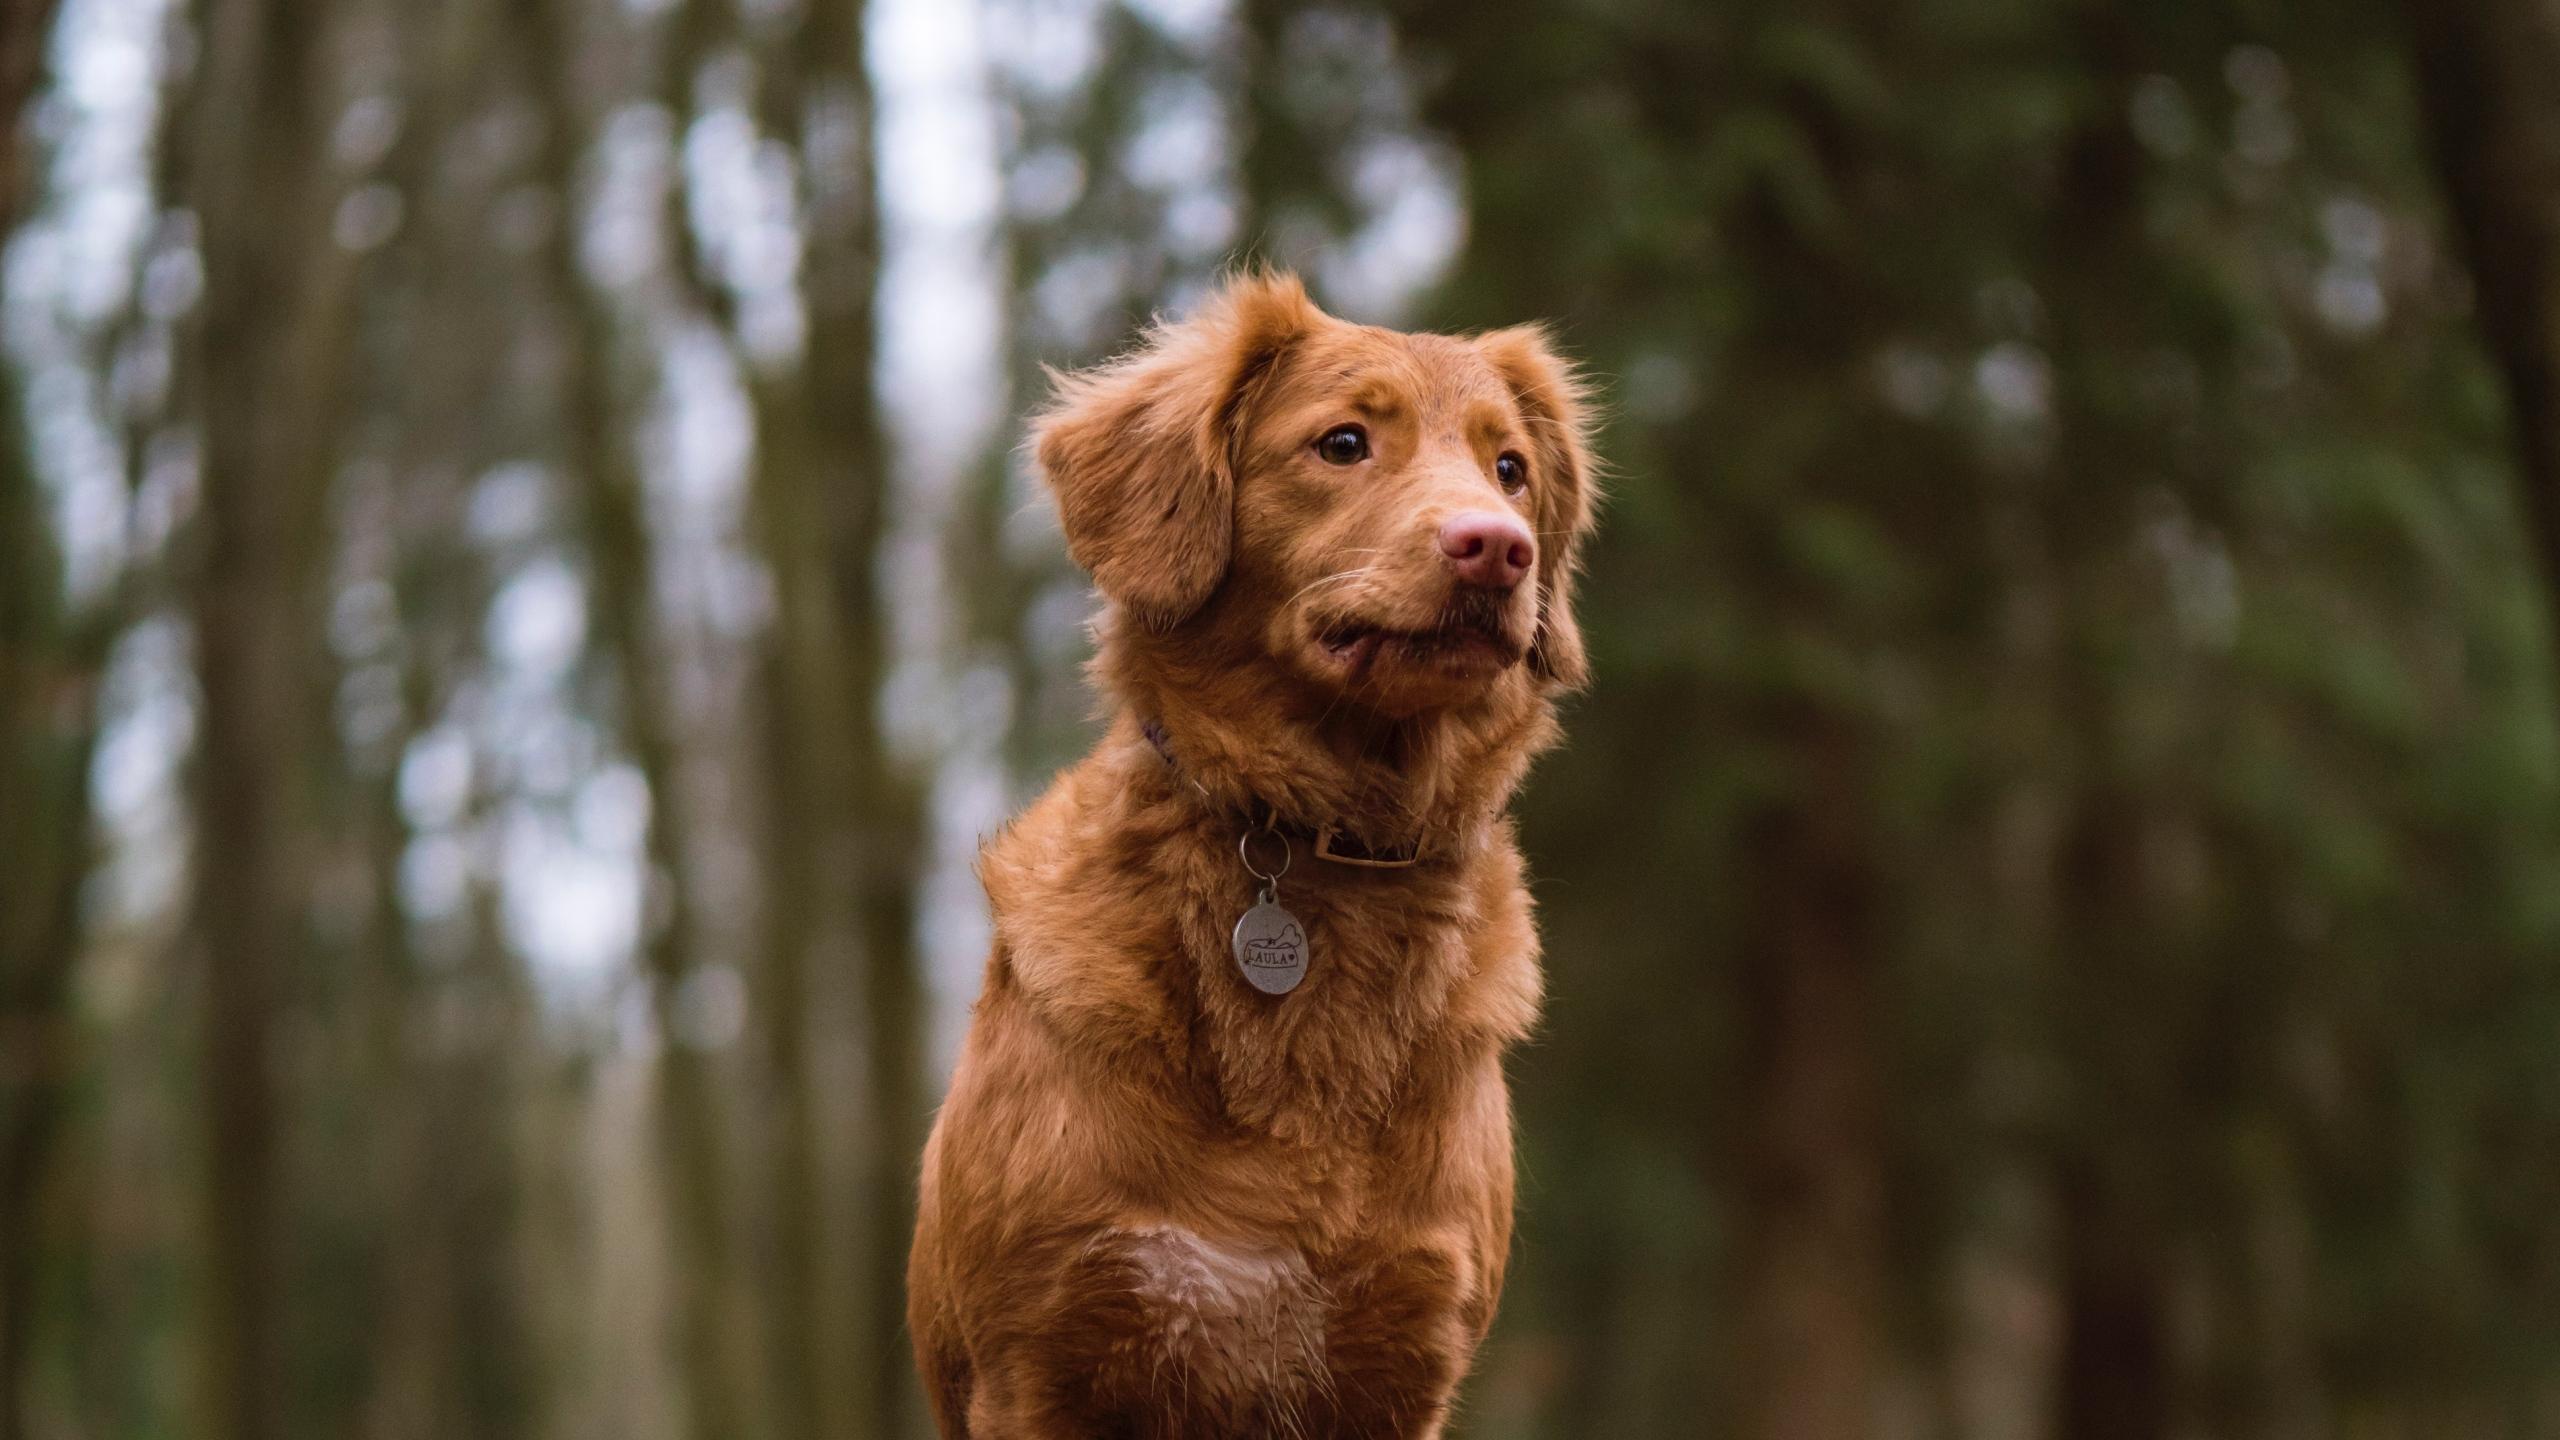 HDoboi.Kiev.ua - Рыжий пёс с моделью на шее, картинки обои на телефон собаки